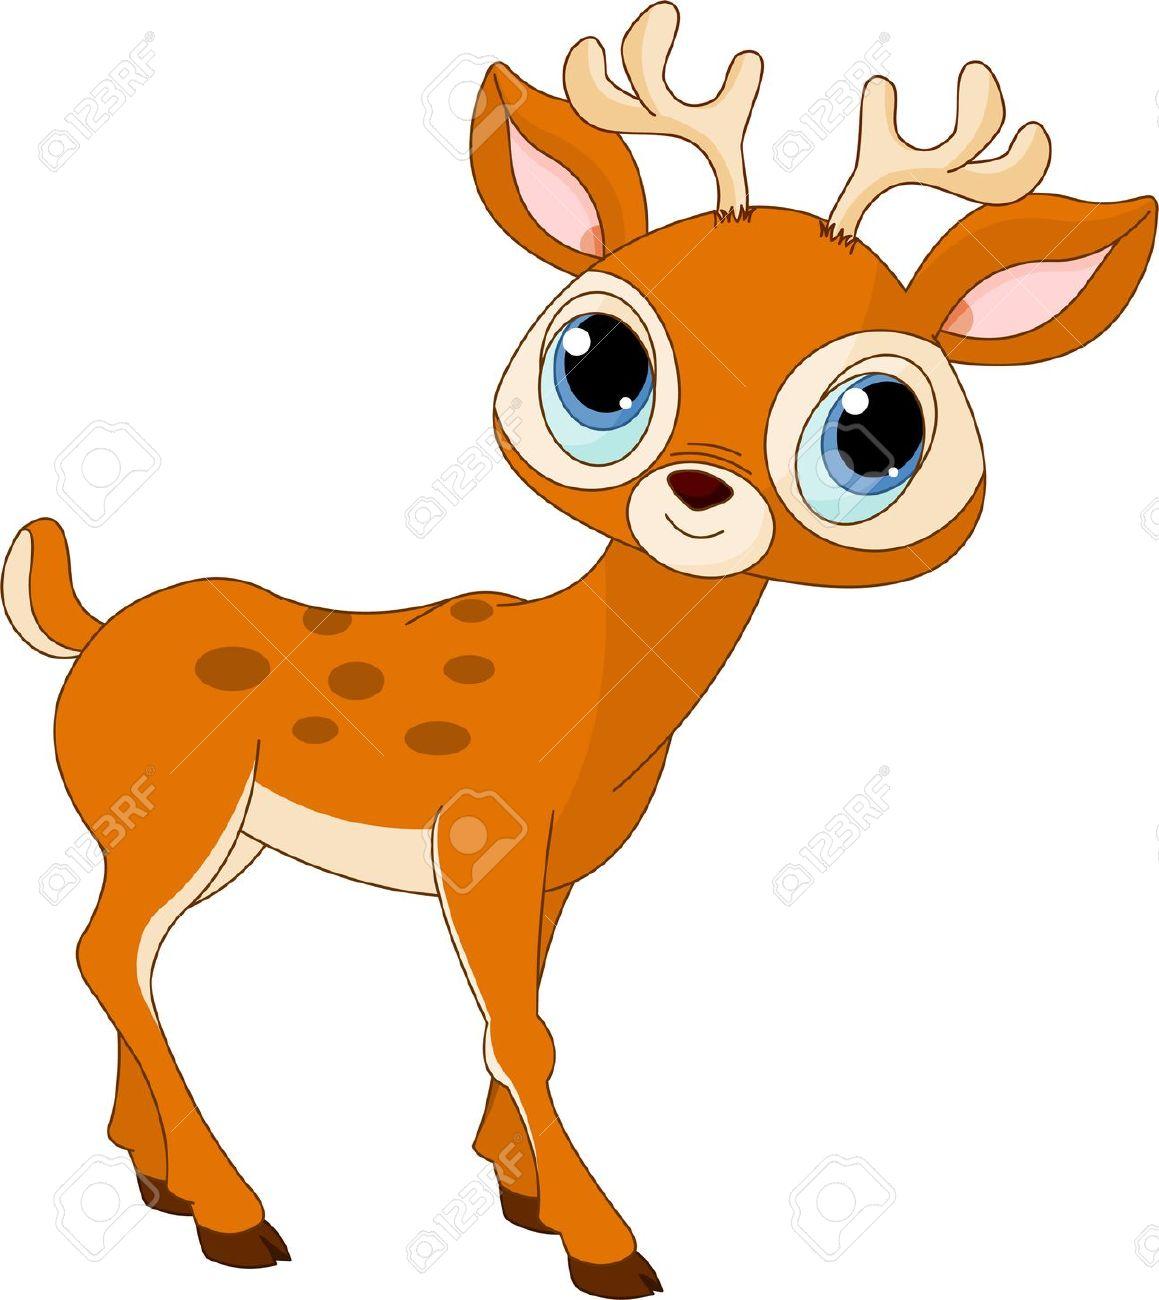 1159x1300 Of Beautiful Cartoon Deer Stock Vector Animals Id 32211 Clipart